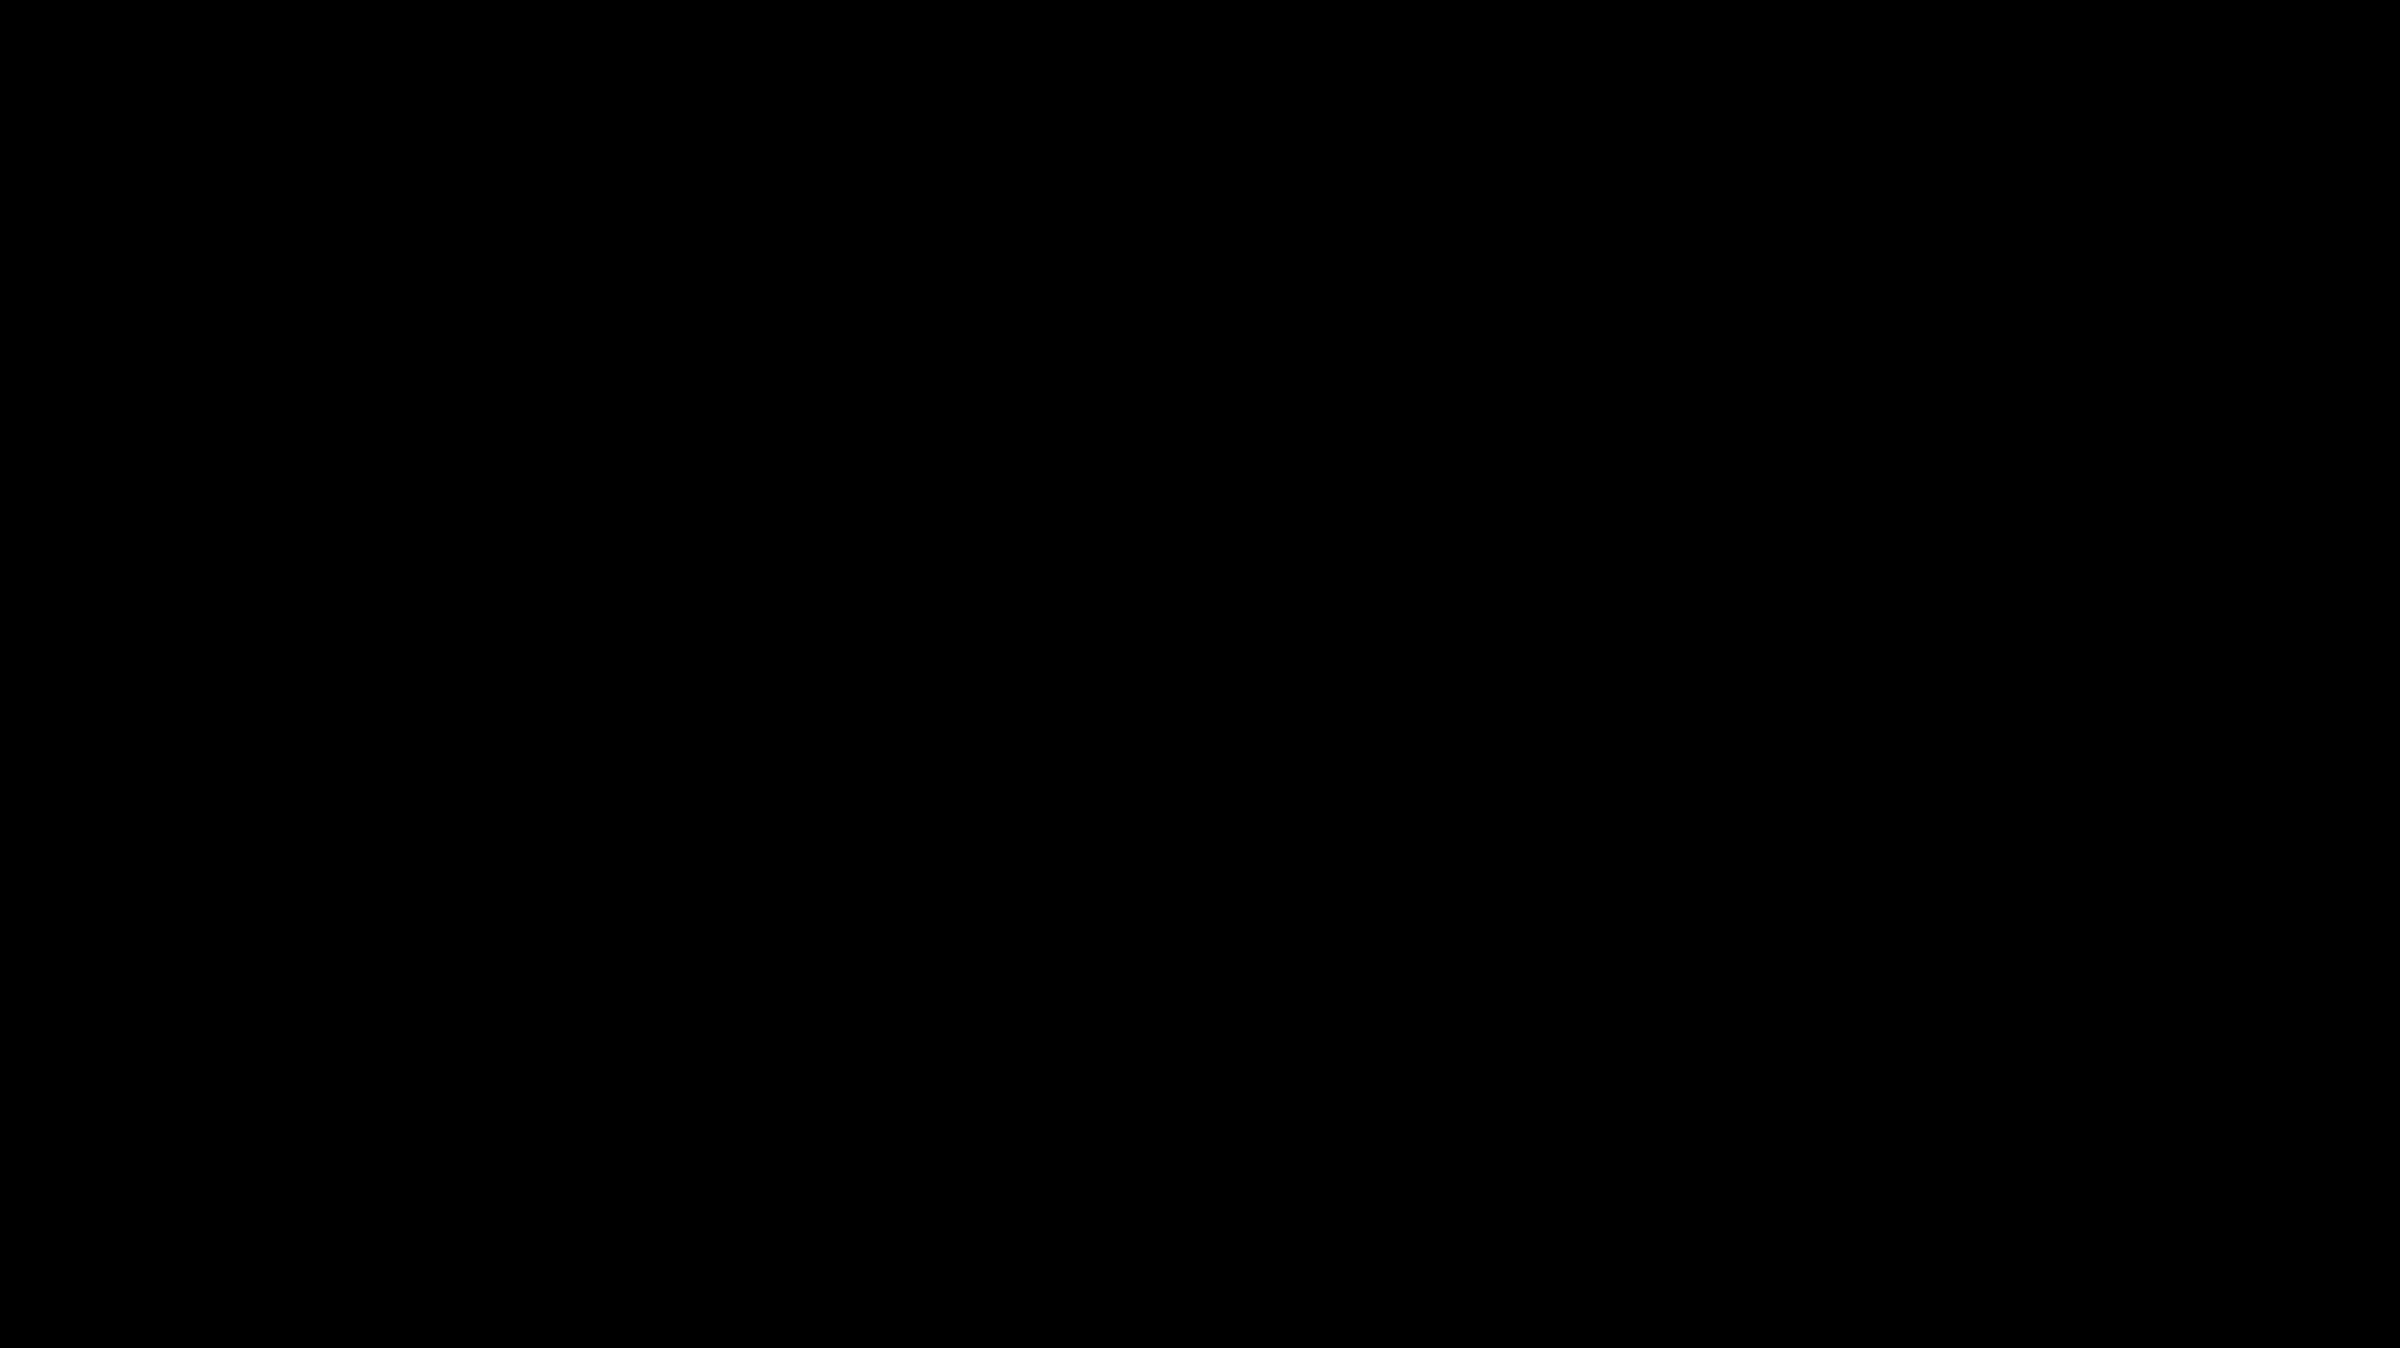 Crane And Excavator Vector Clipart Image